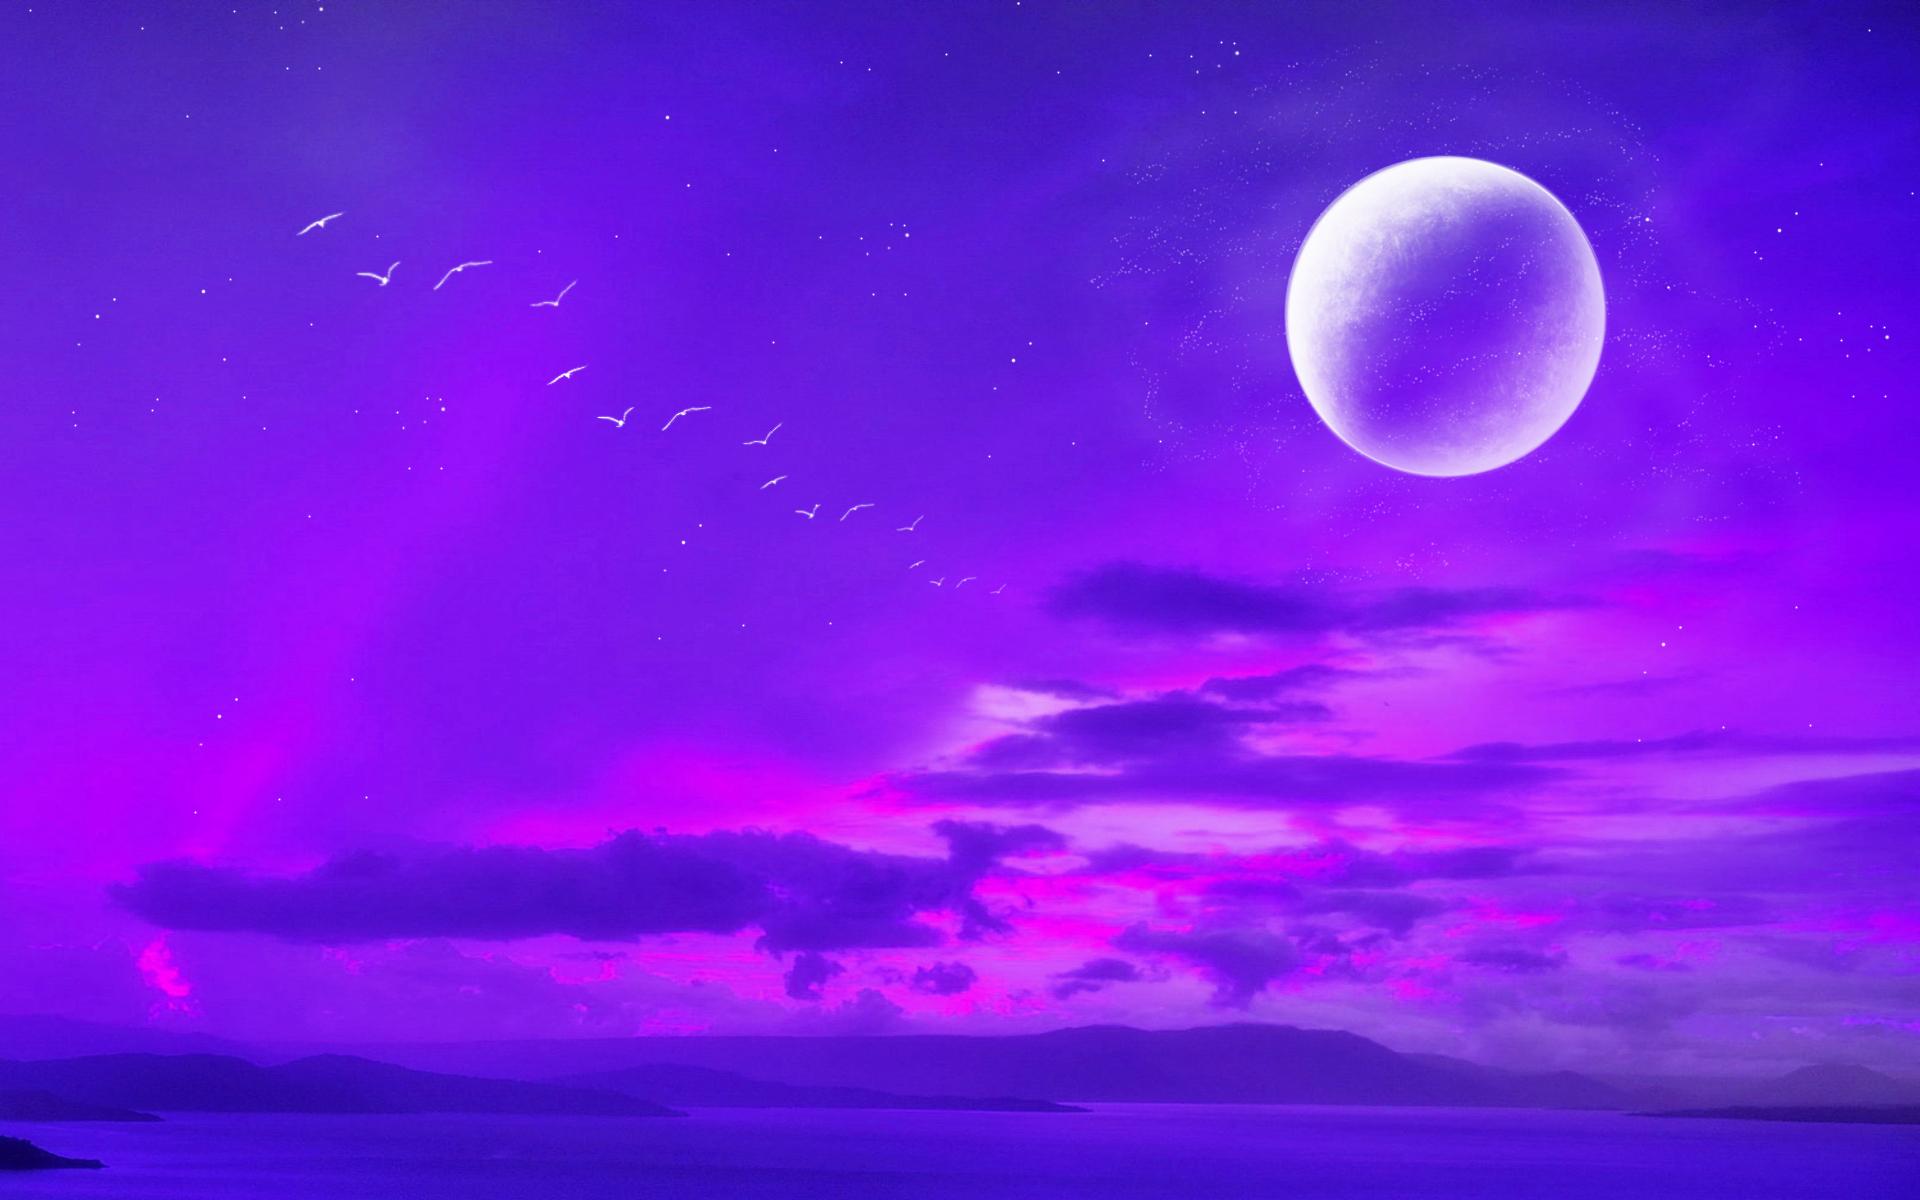 render moon night river dreaming landscape hd wallpaper 1920x1200